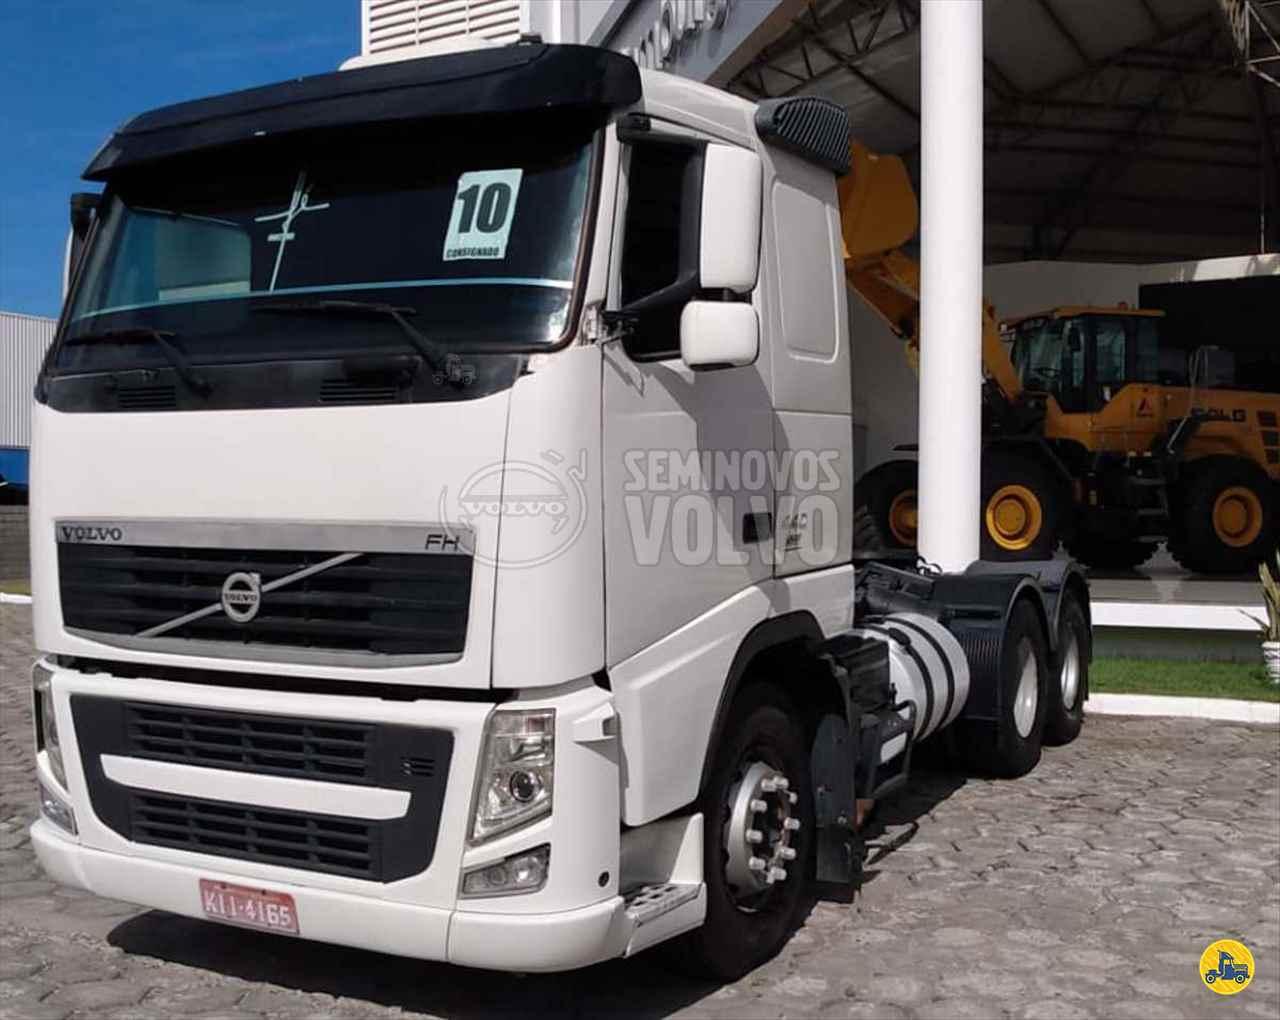 CAMINHAO VOLVO VOLVO FH 440 Cavalo Mecânico Truck 6x2 SEMINOVOS VOLVO CURITIBA PARANÁ PR